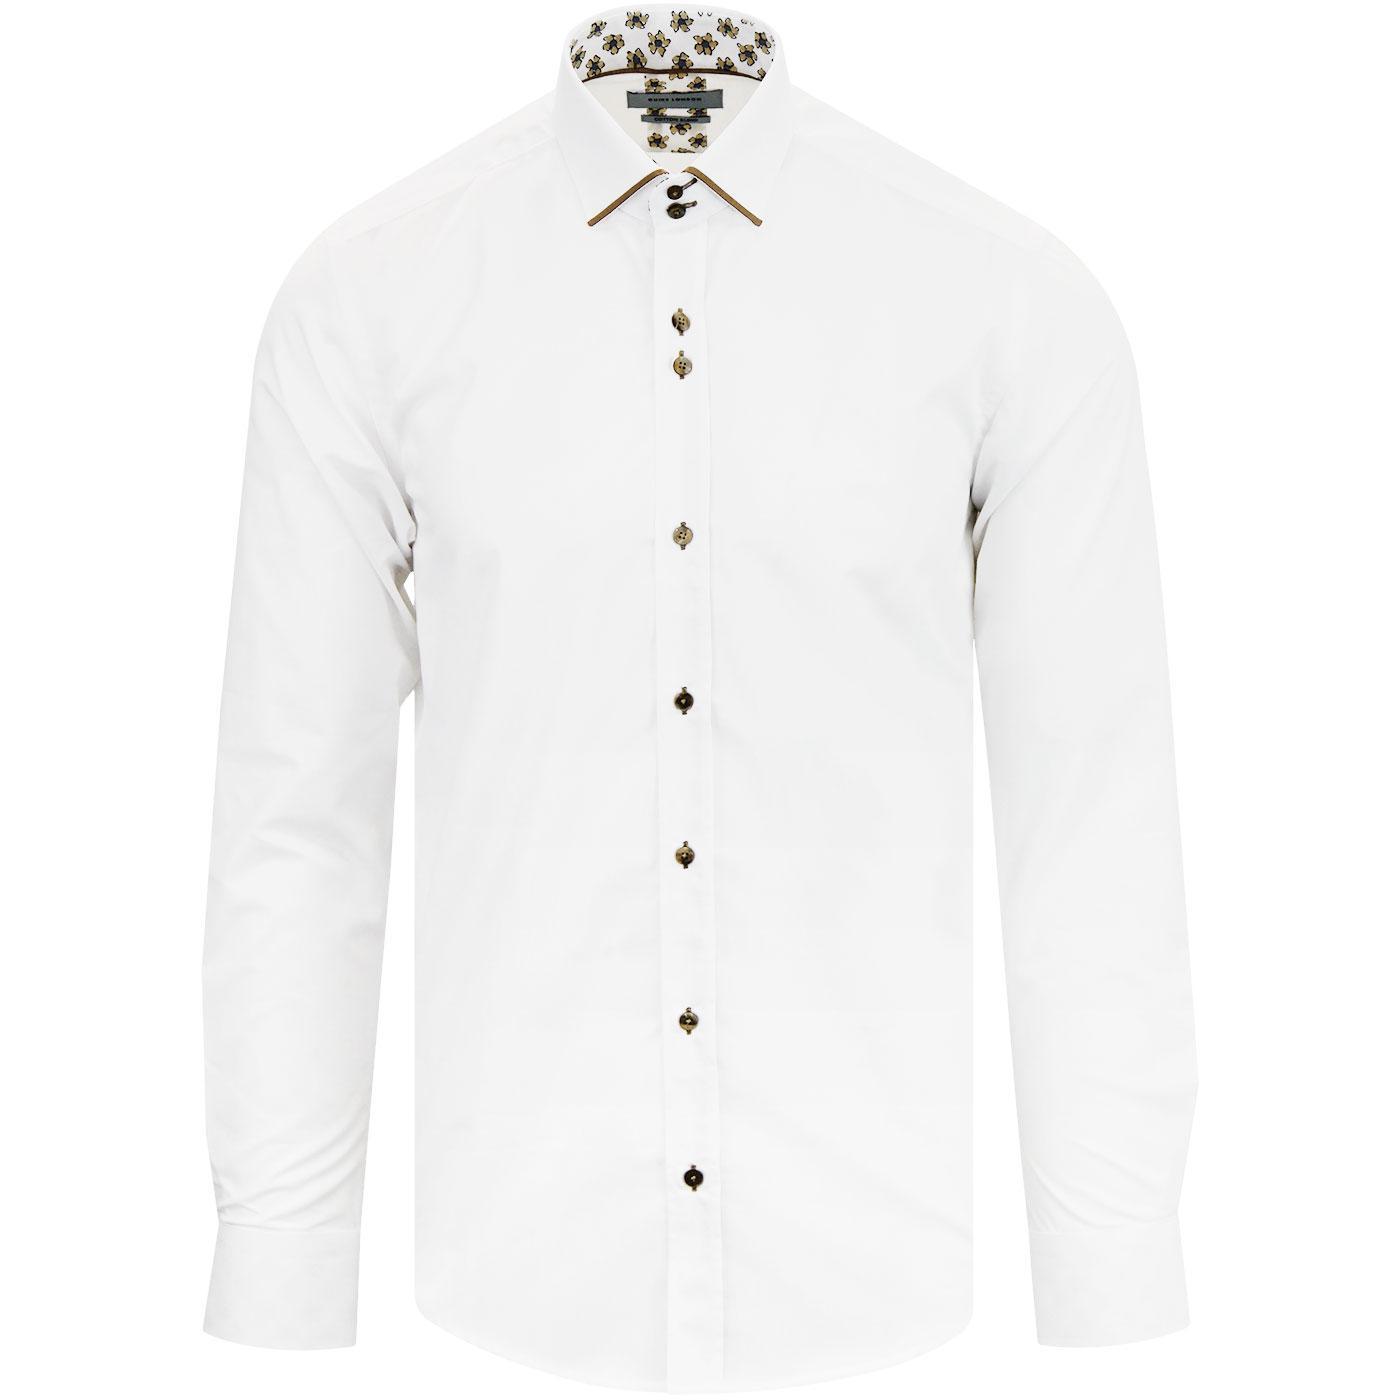 GUIDE LONDON Plain L/S Trimmed Mod Shirt WHITE/TAN